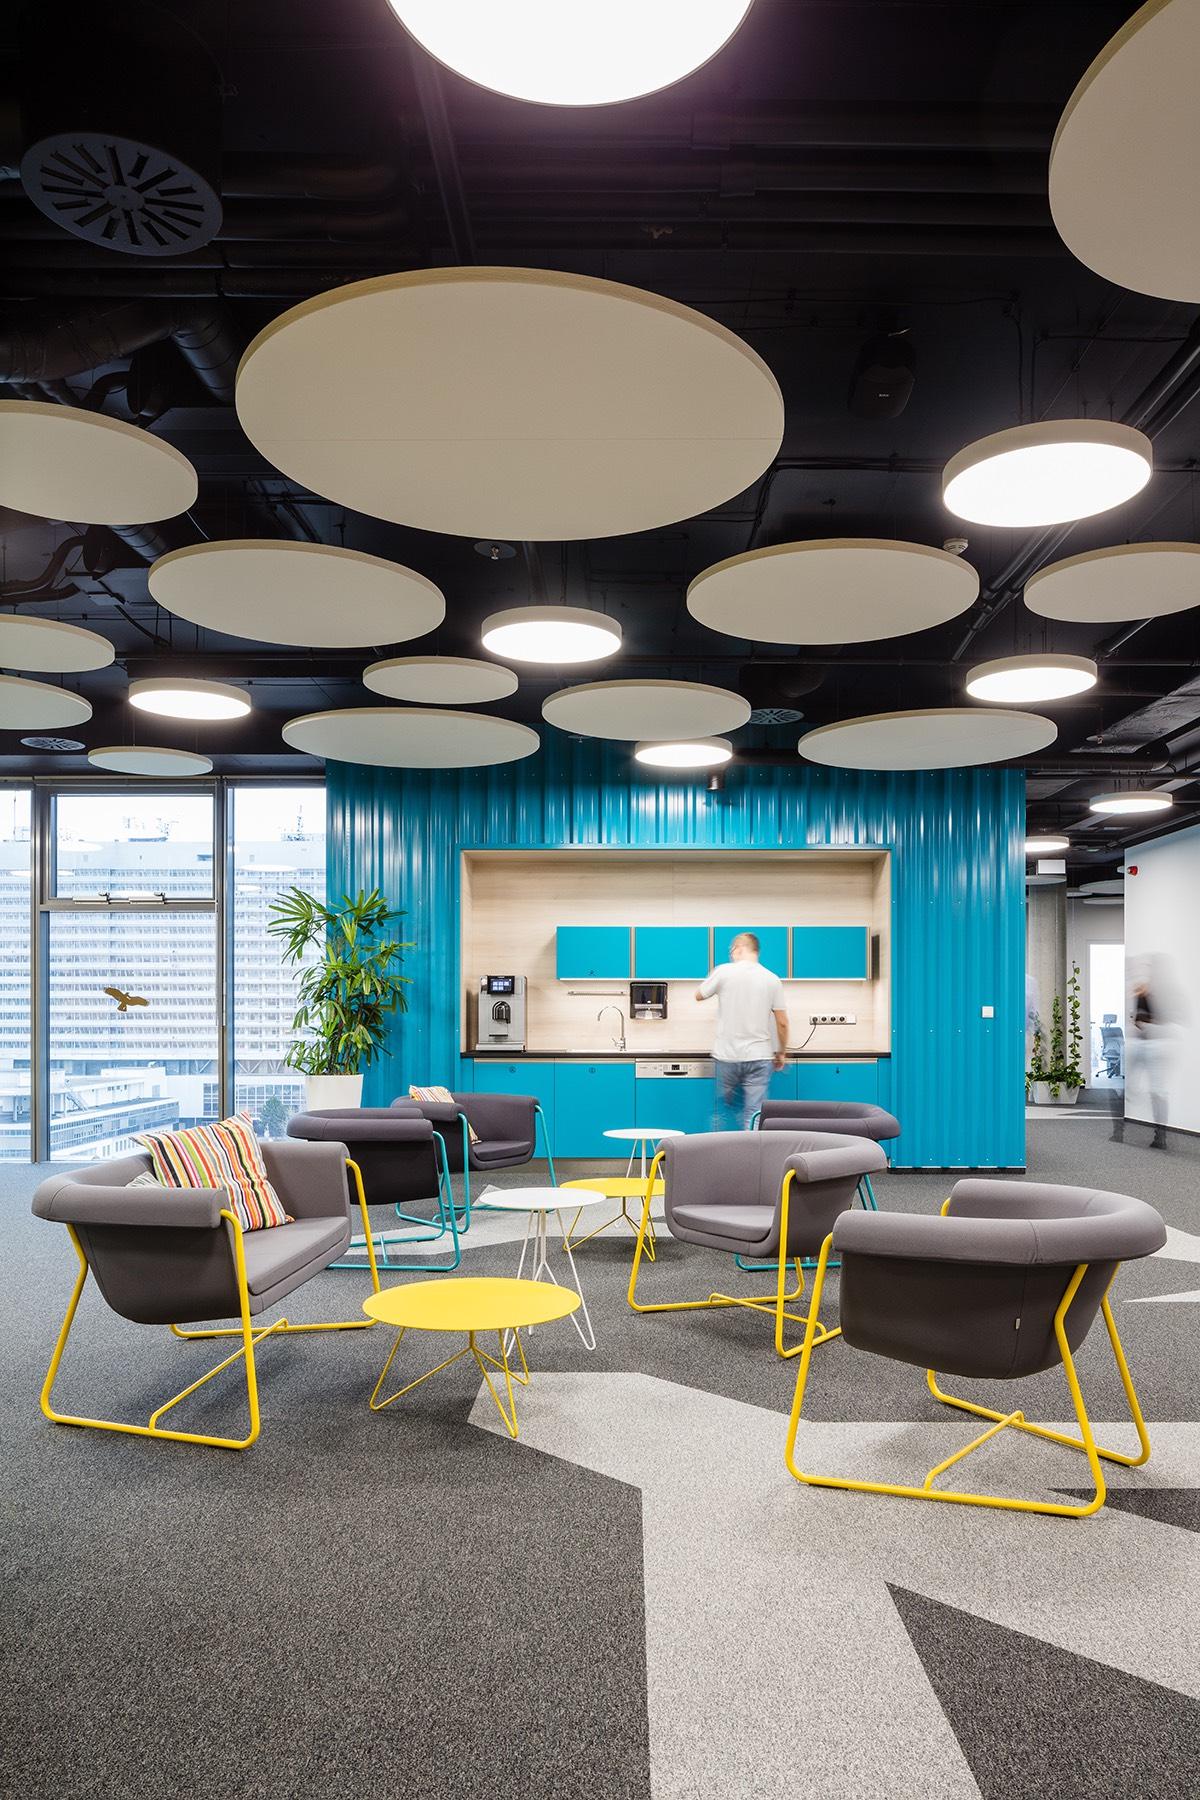 kiwi-office-brno-10